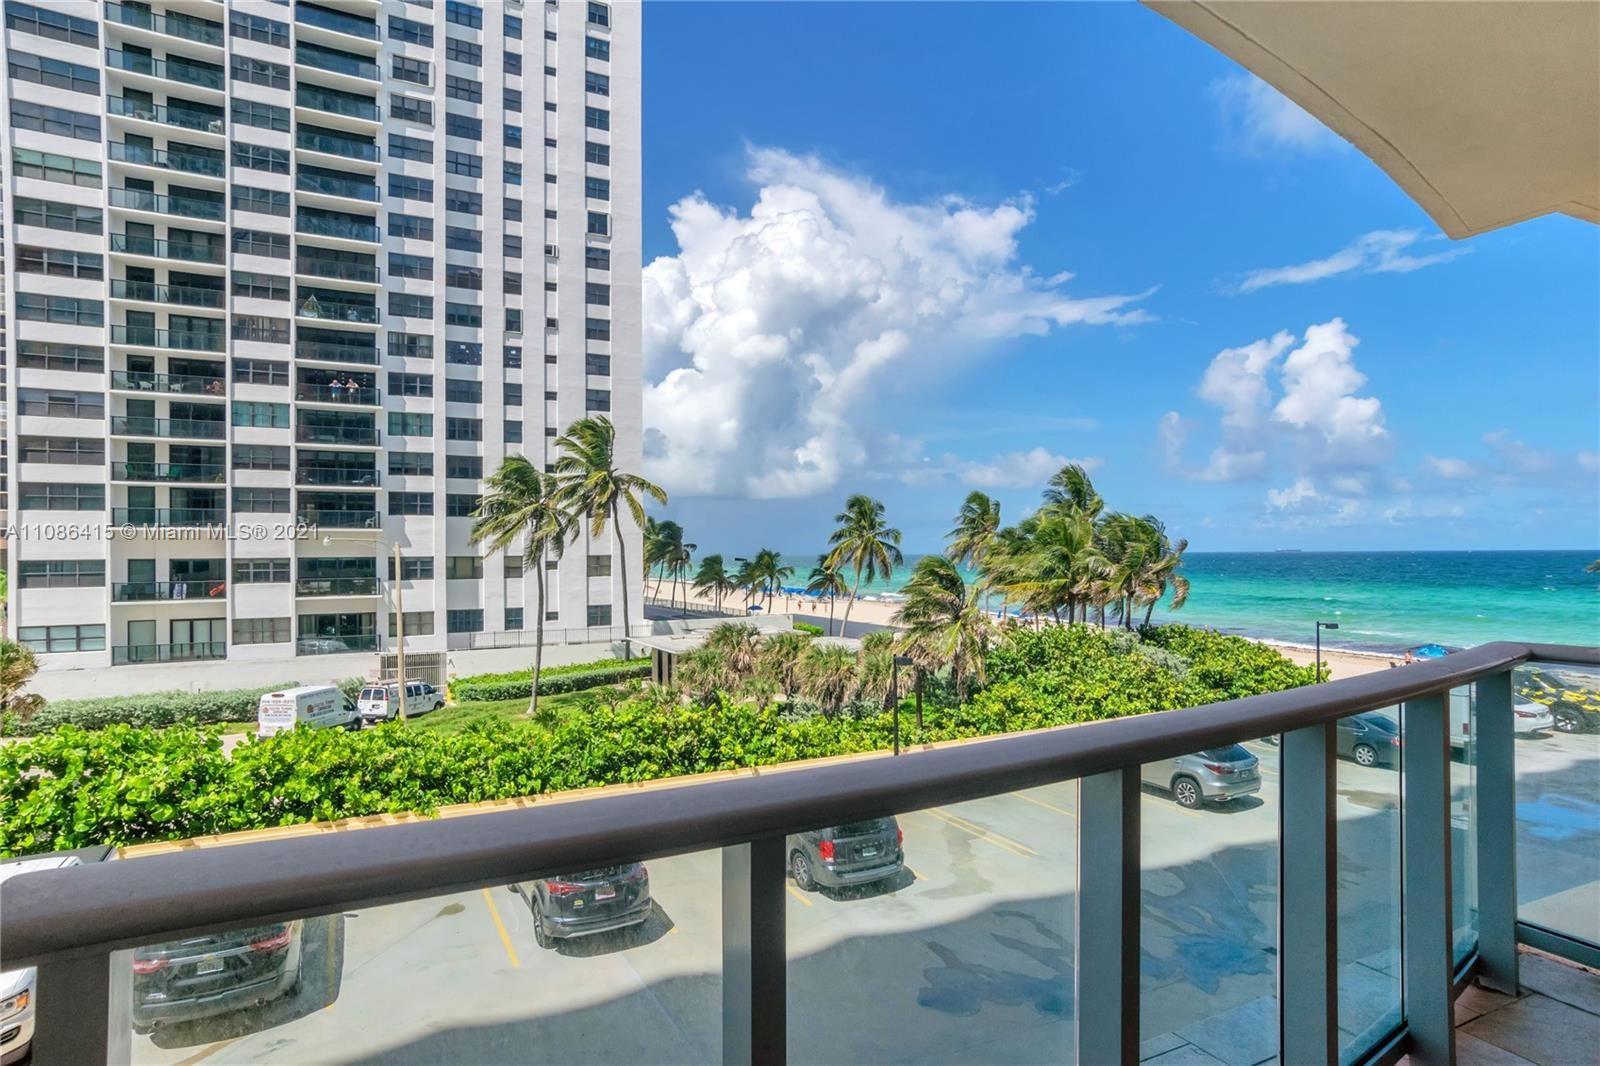 2501 S Ocean Dr #308, Hollywood, FL 33019 - #: A11086415